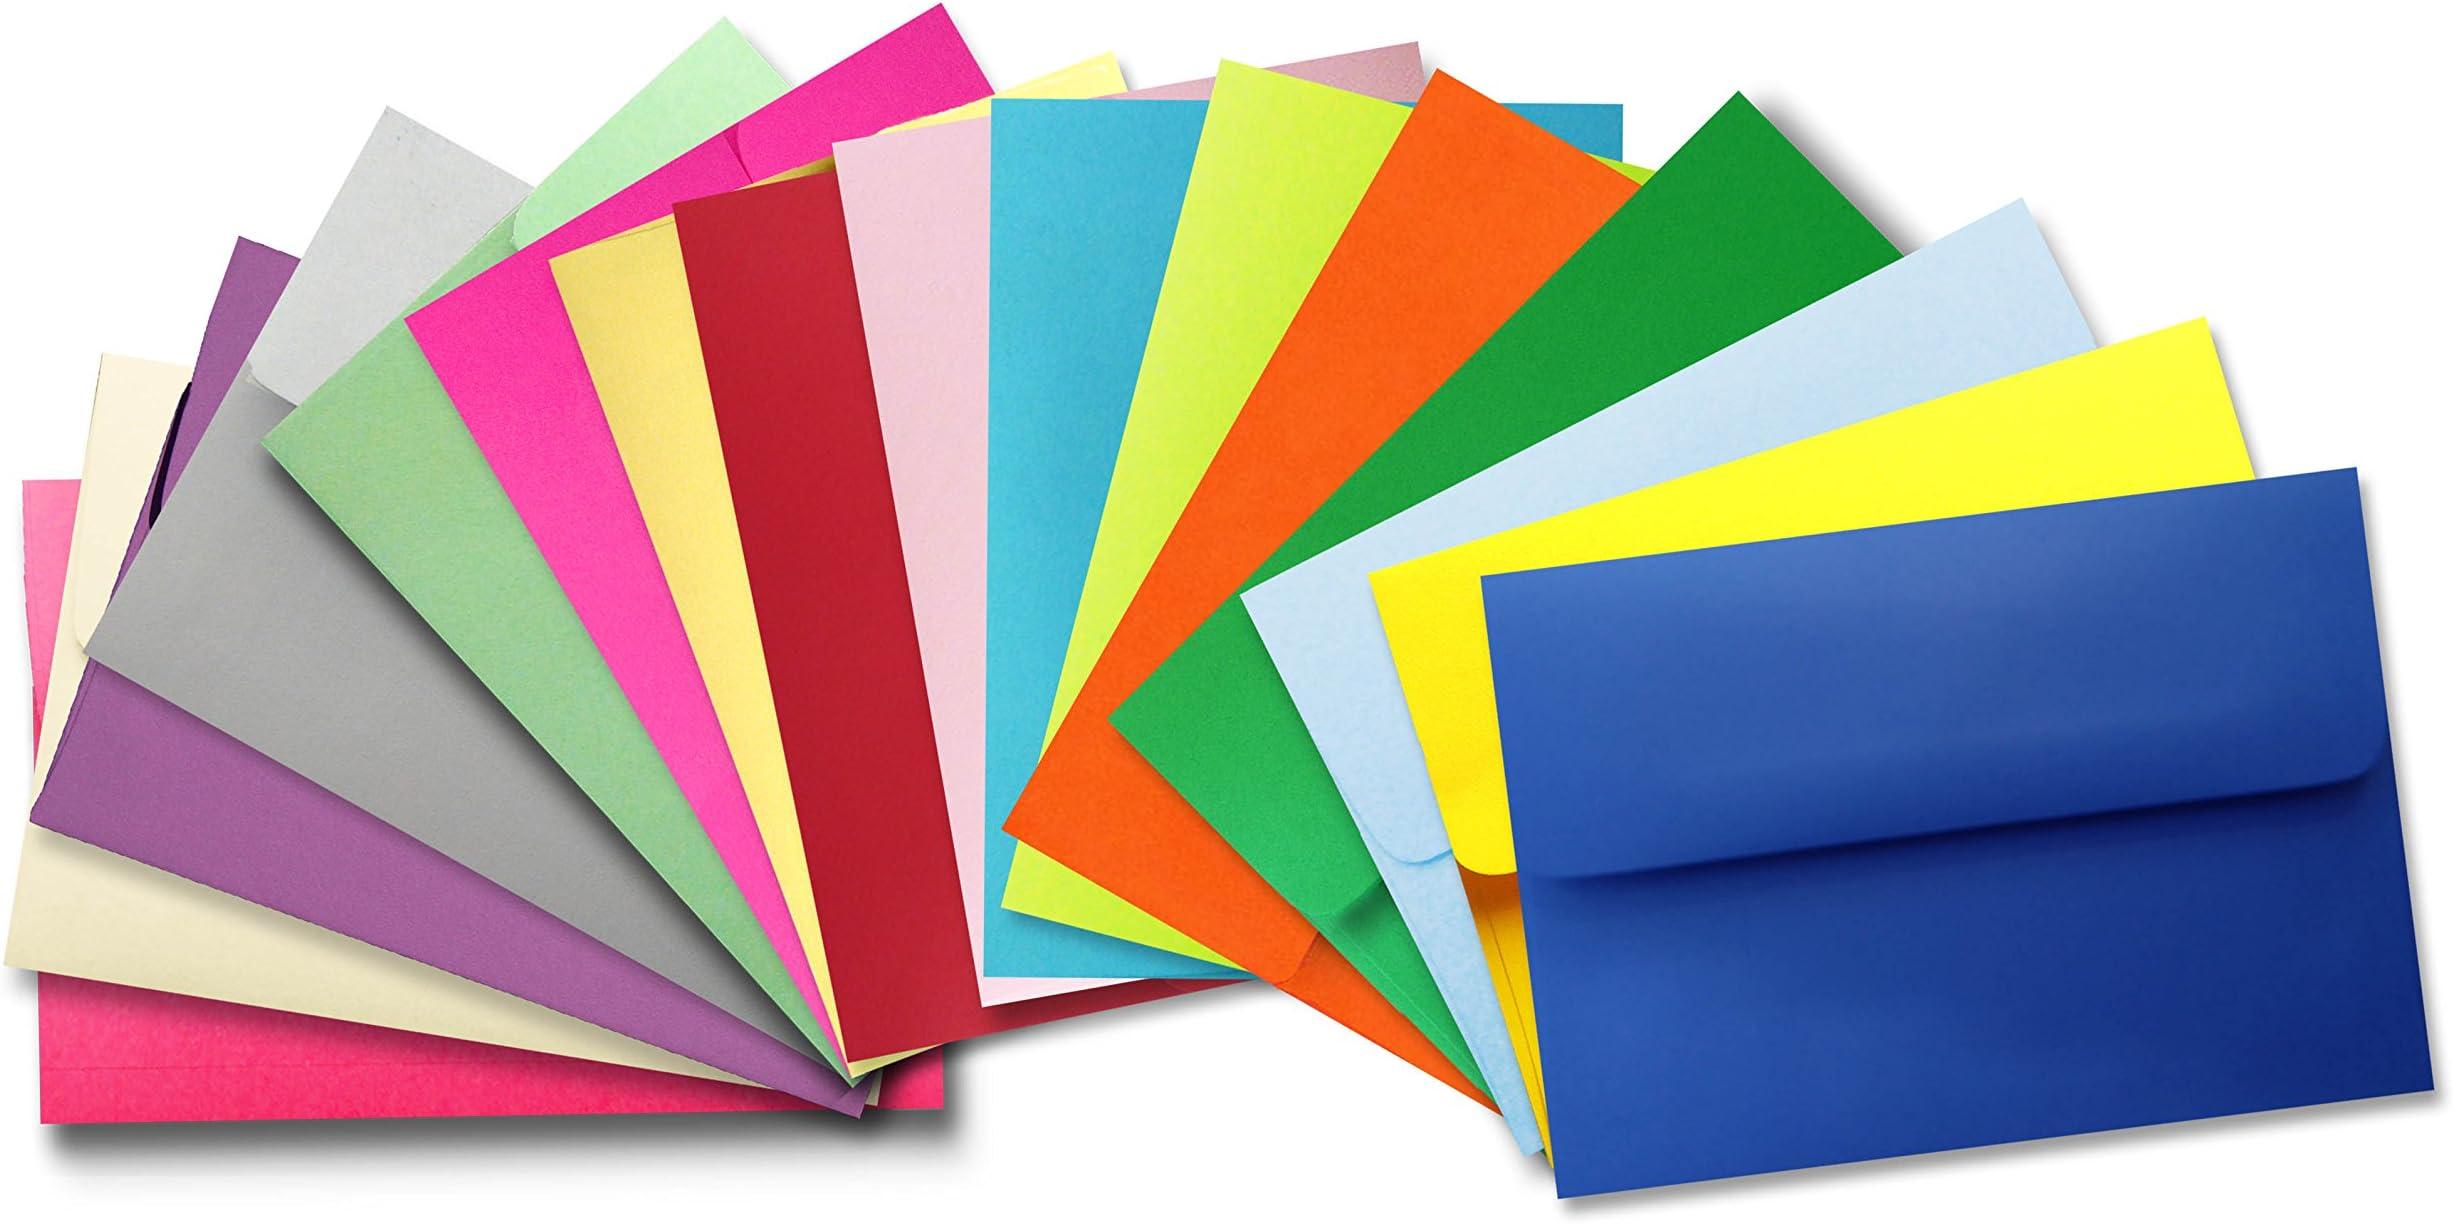 A2 Envelopes  Card Envelopes  Pattern Envelopes  Blank Stationery  Assorted Patterns in Various colors Set of 10